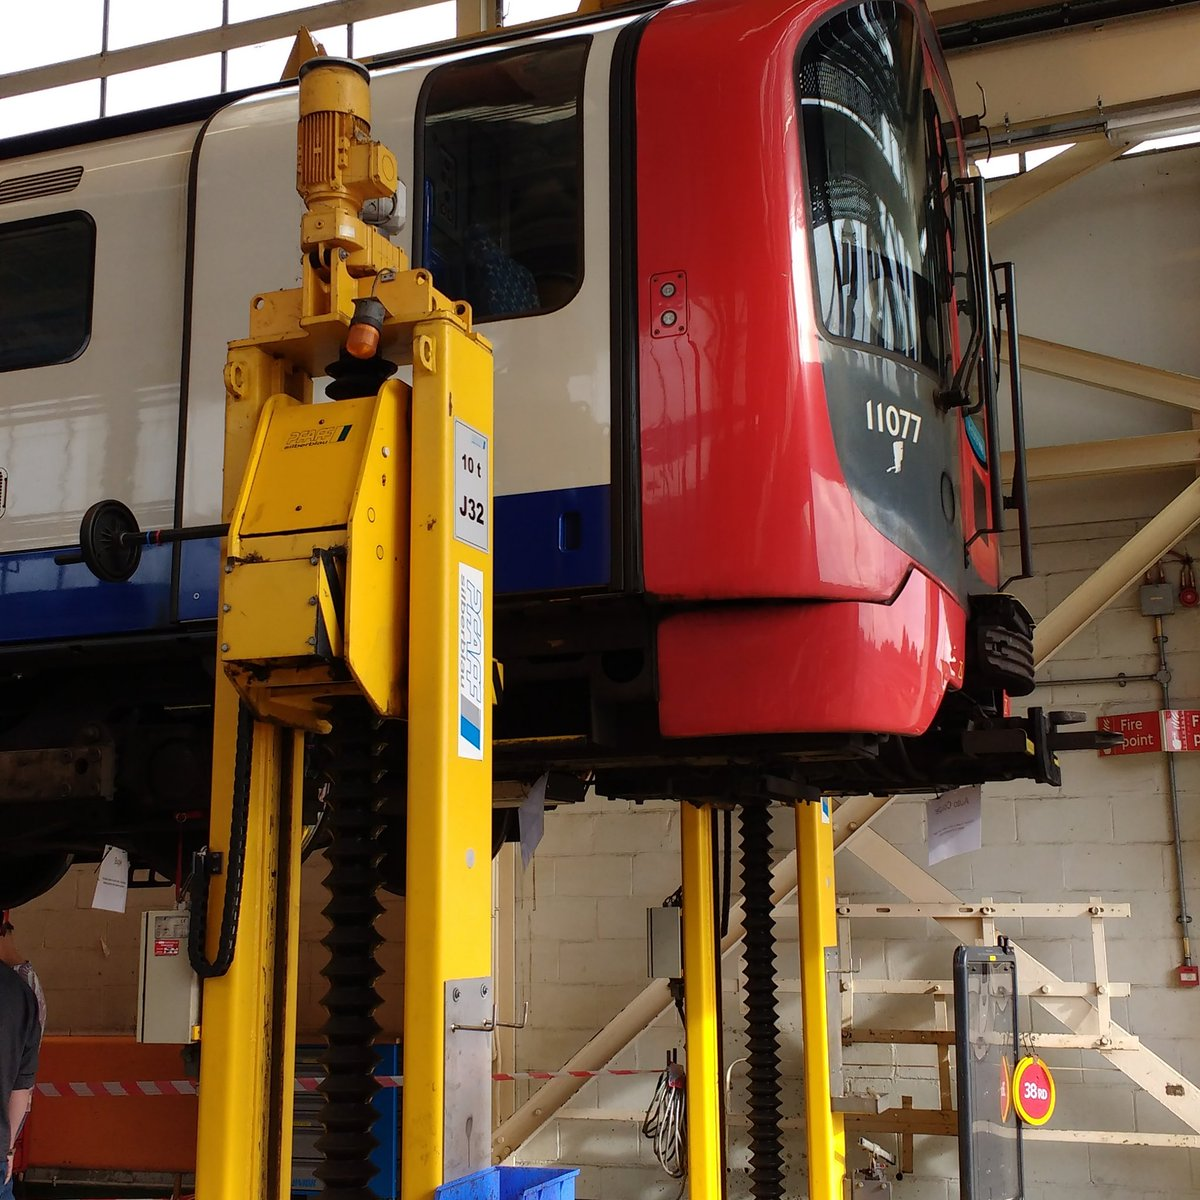 DDl4dJXWAAABuOu - The Victoria Line's really big 50th birthday! #2